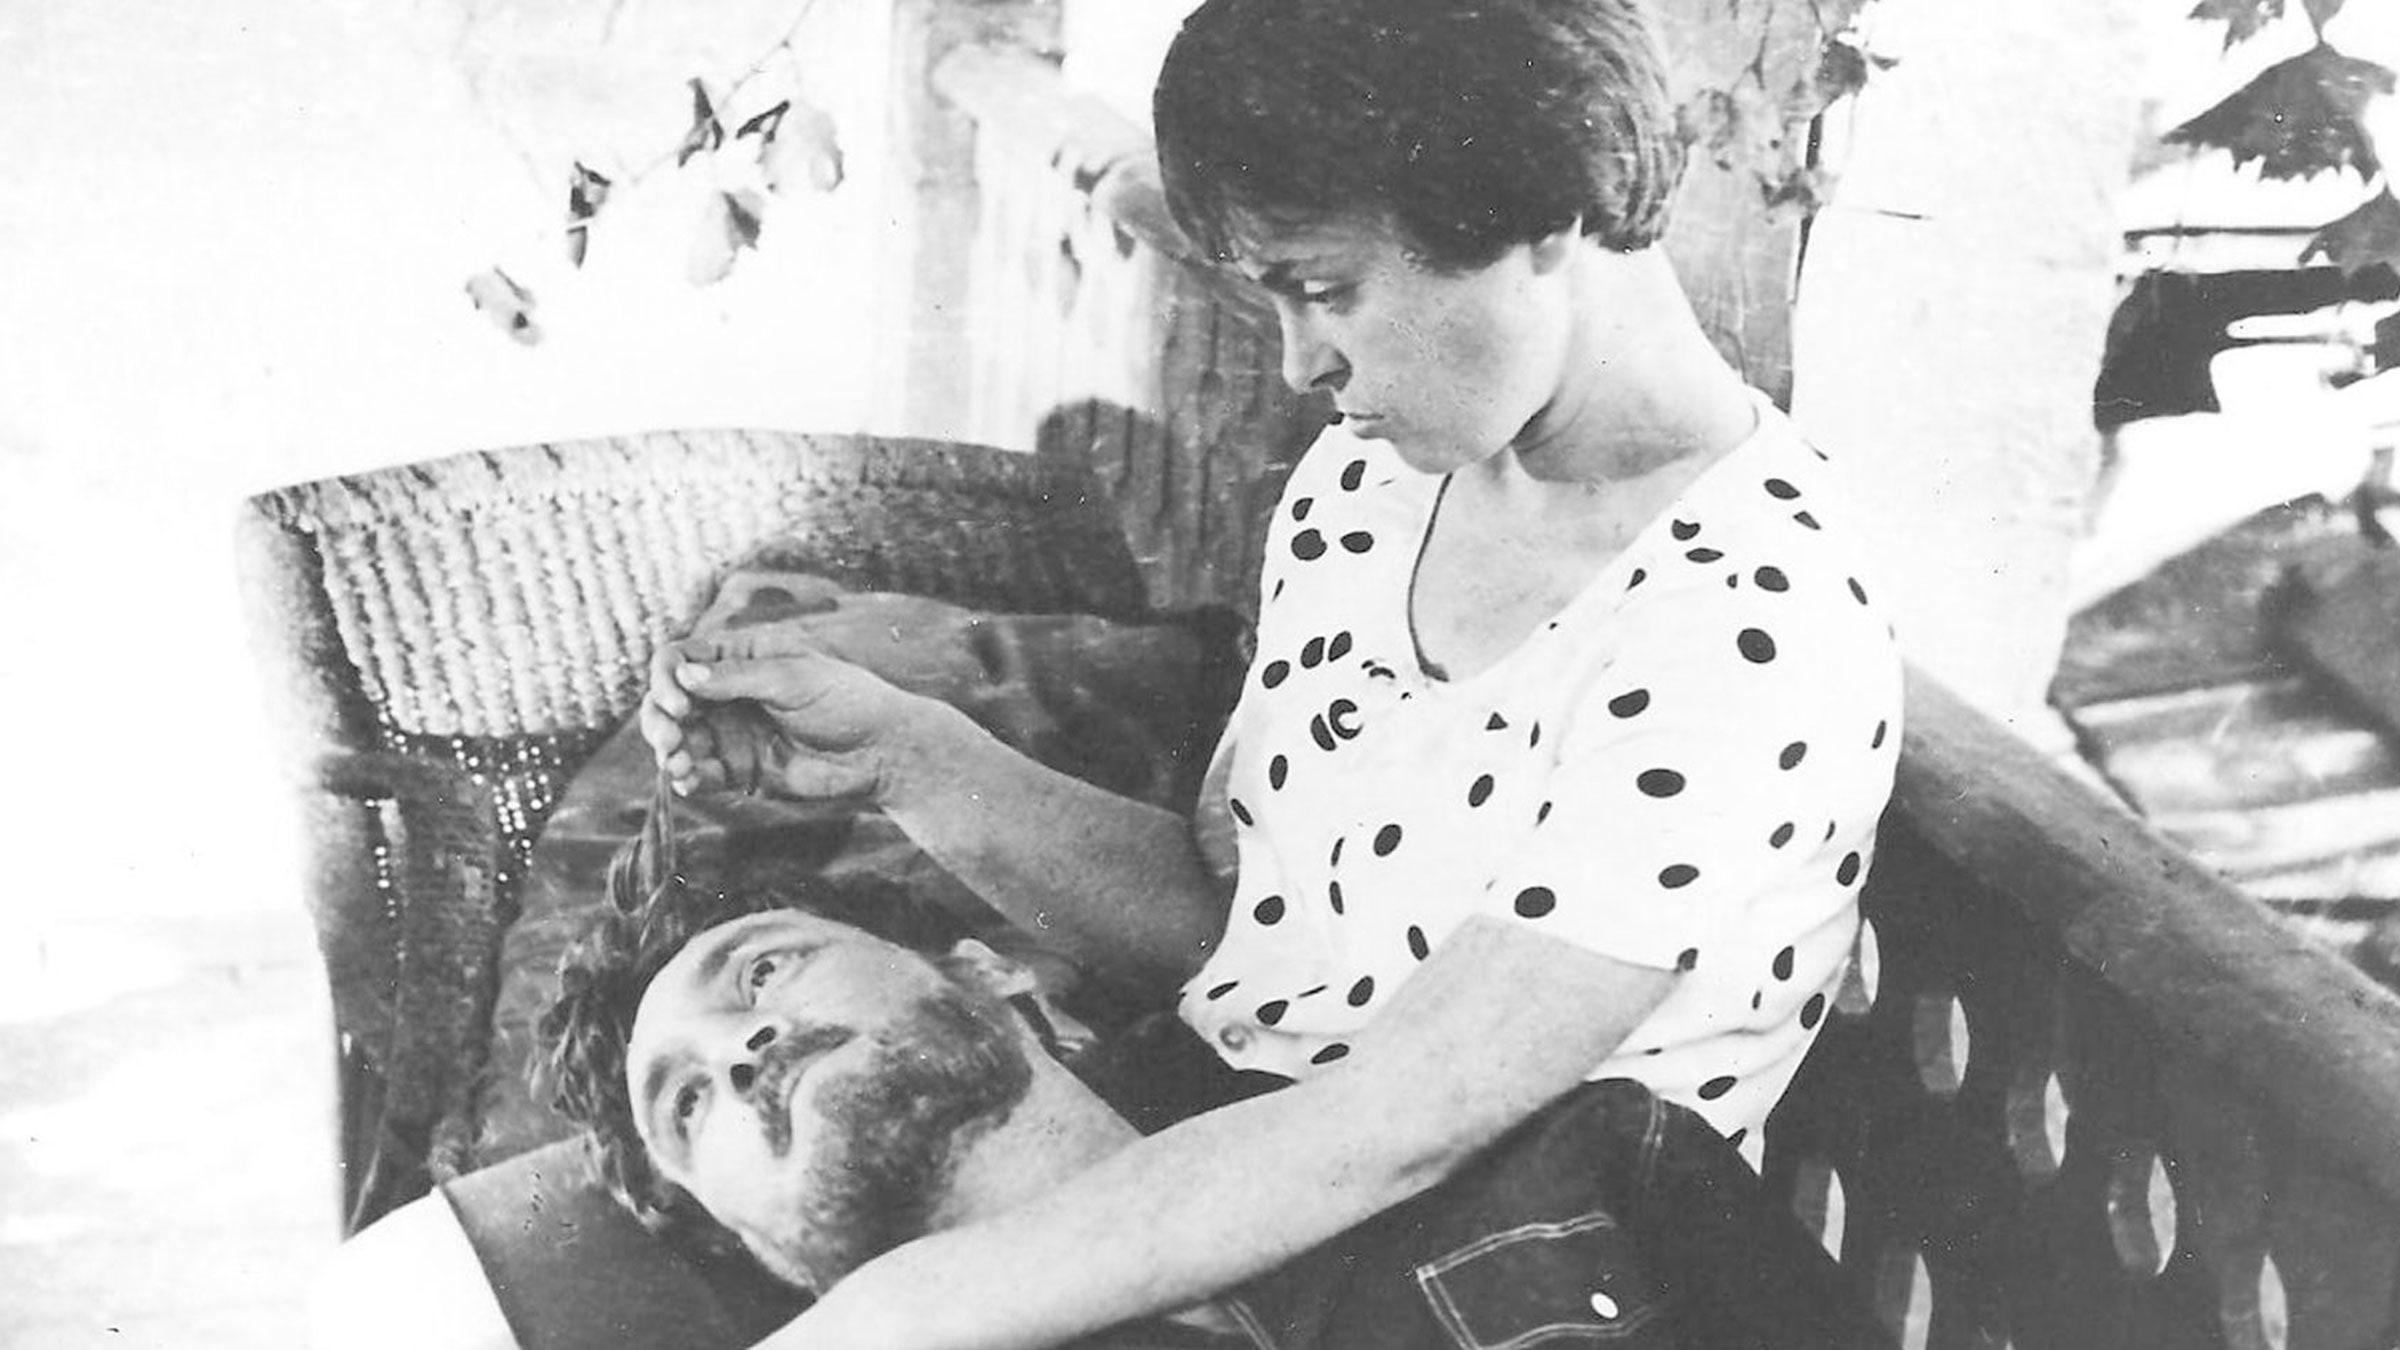 Kira Muratova <br/>Gölgede Kalan Aşk